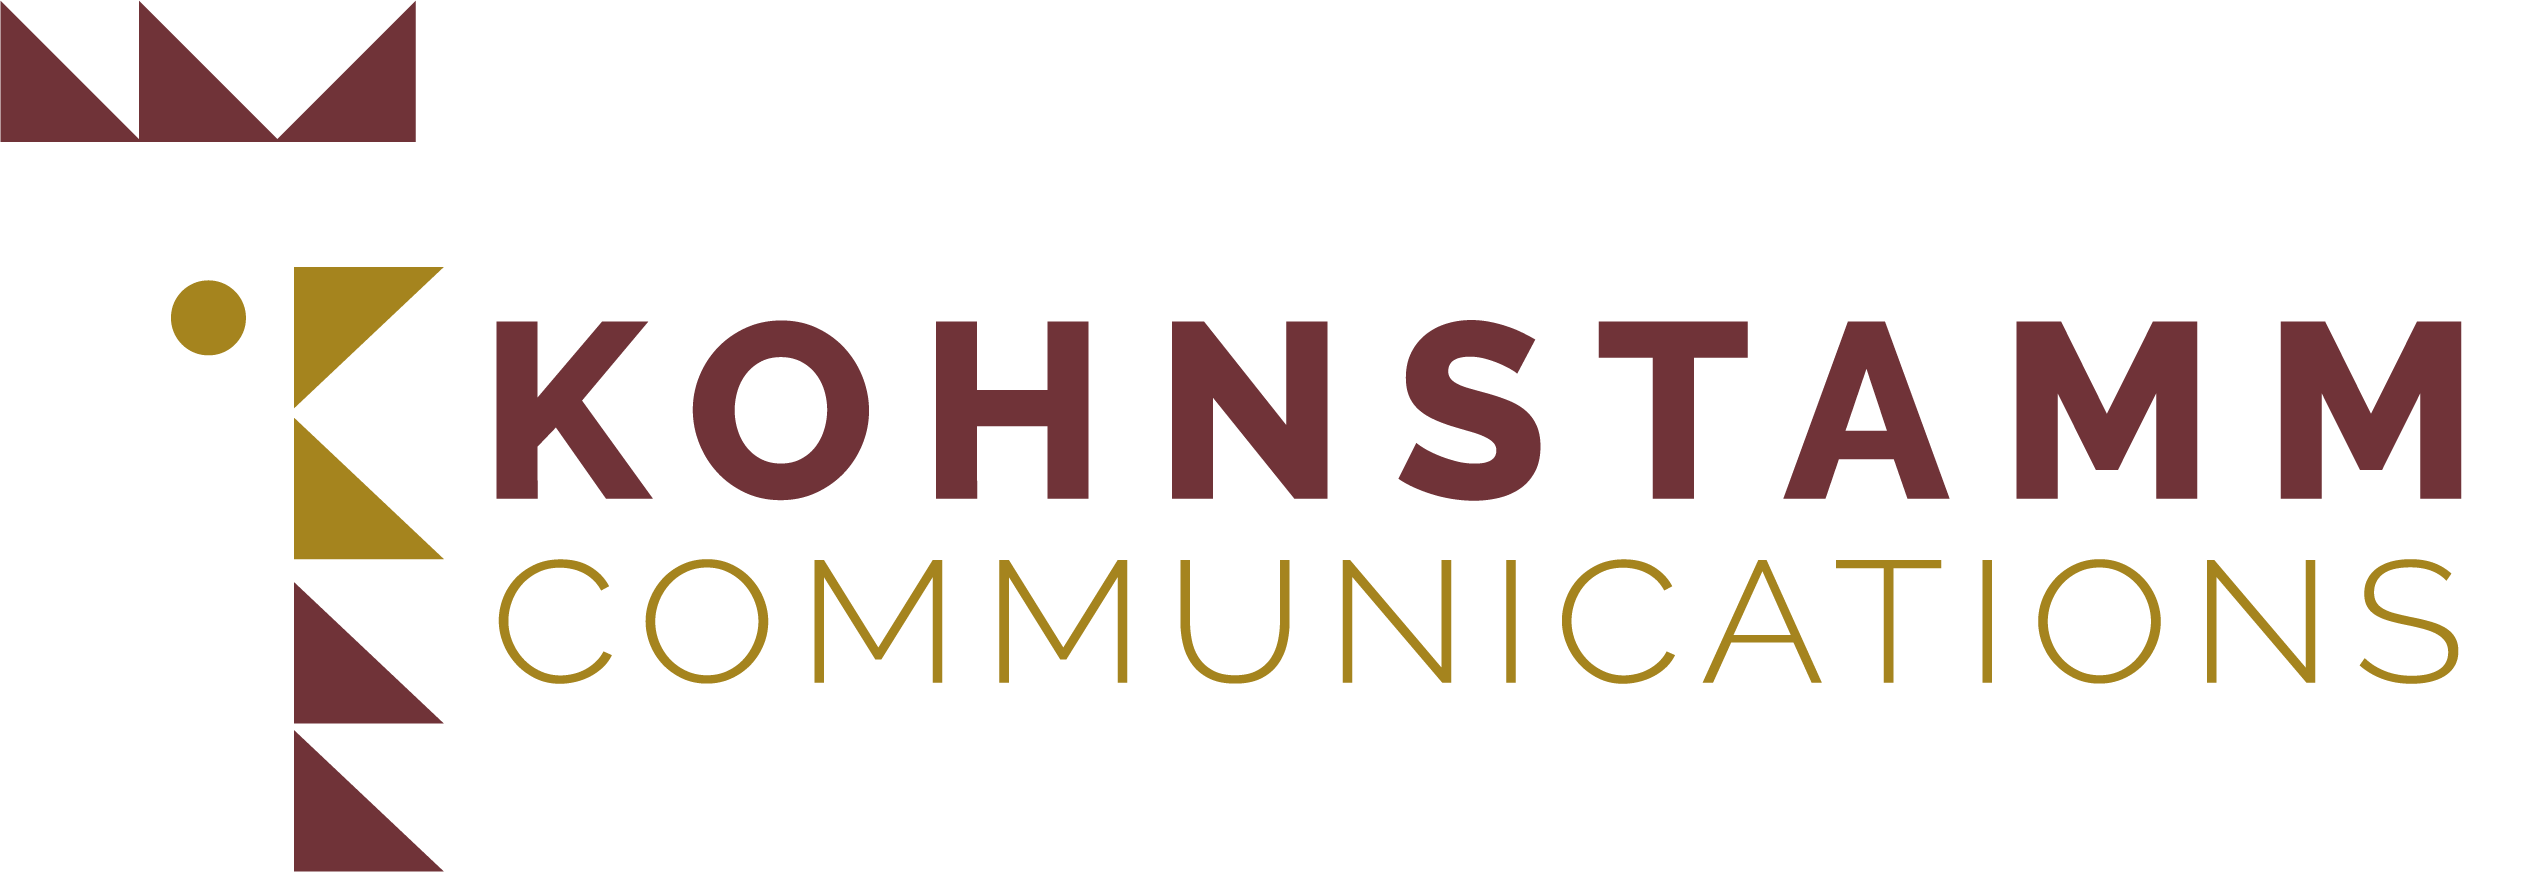 Kohnstamm Communications